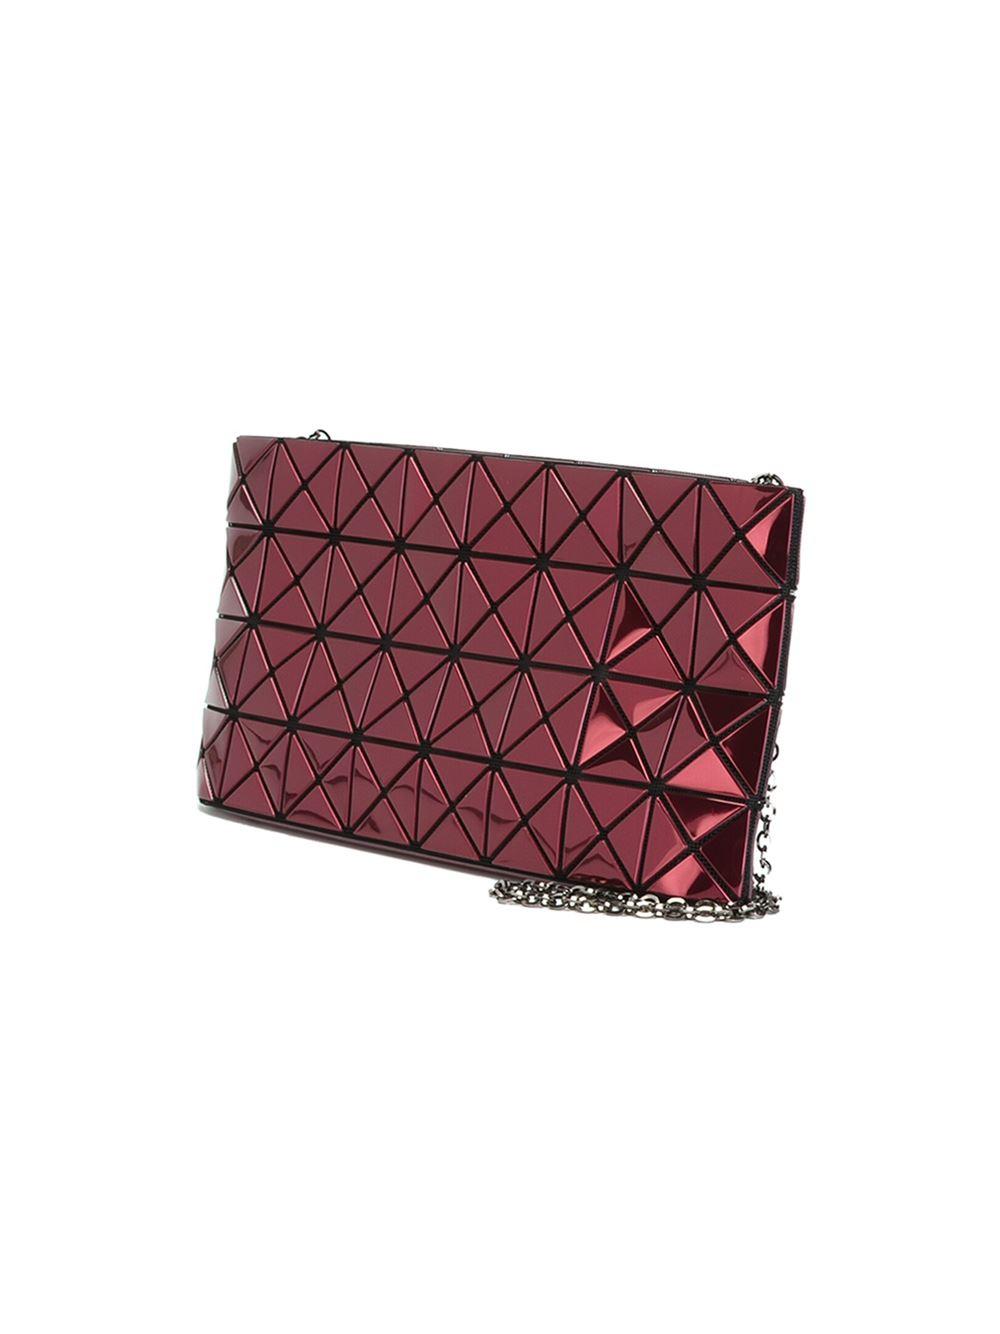 Bao Bao Issey Miyake Platinum 2 Shoulder Bag In Pink